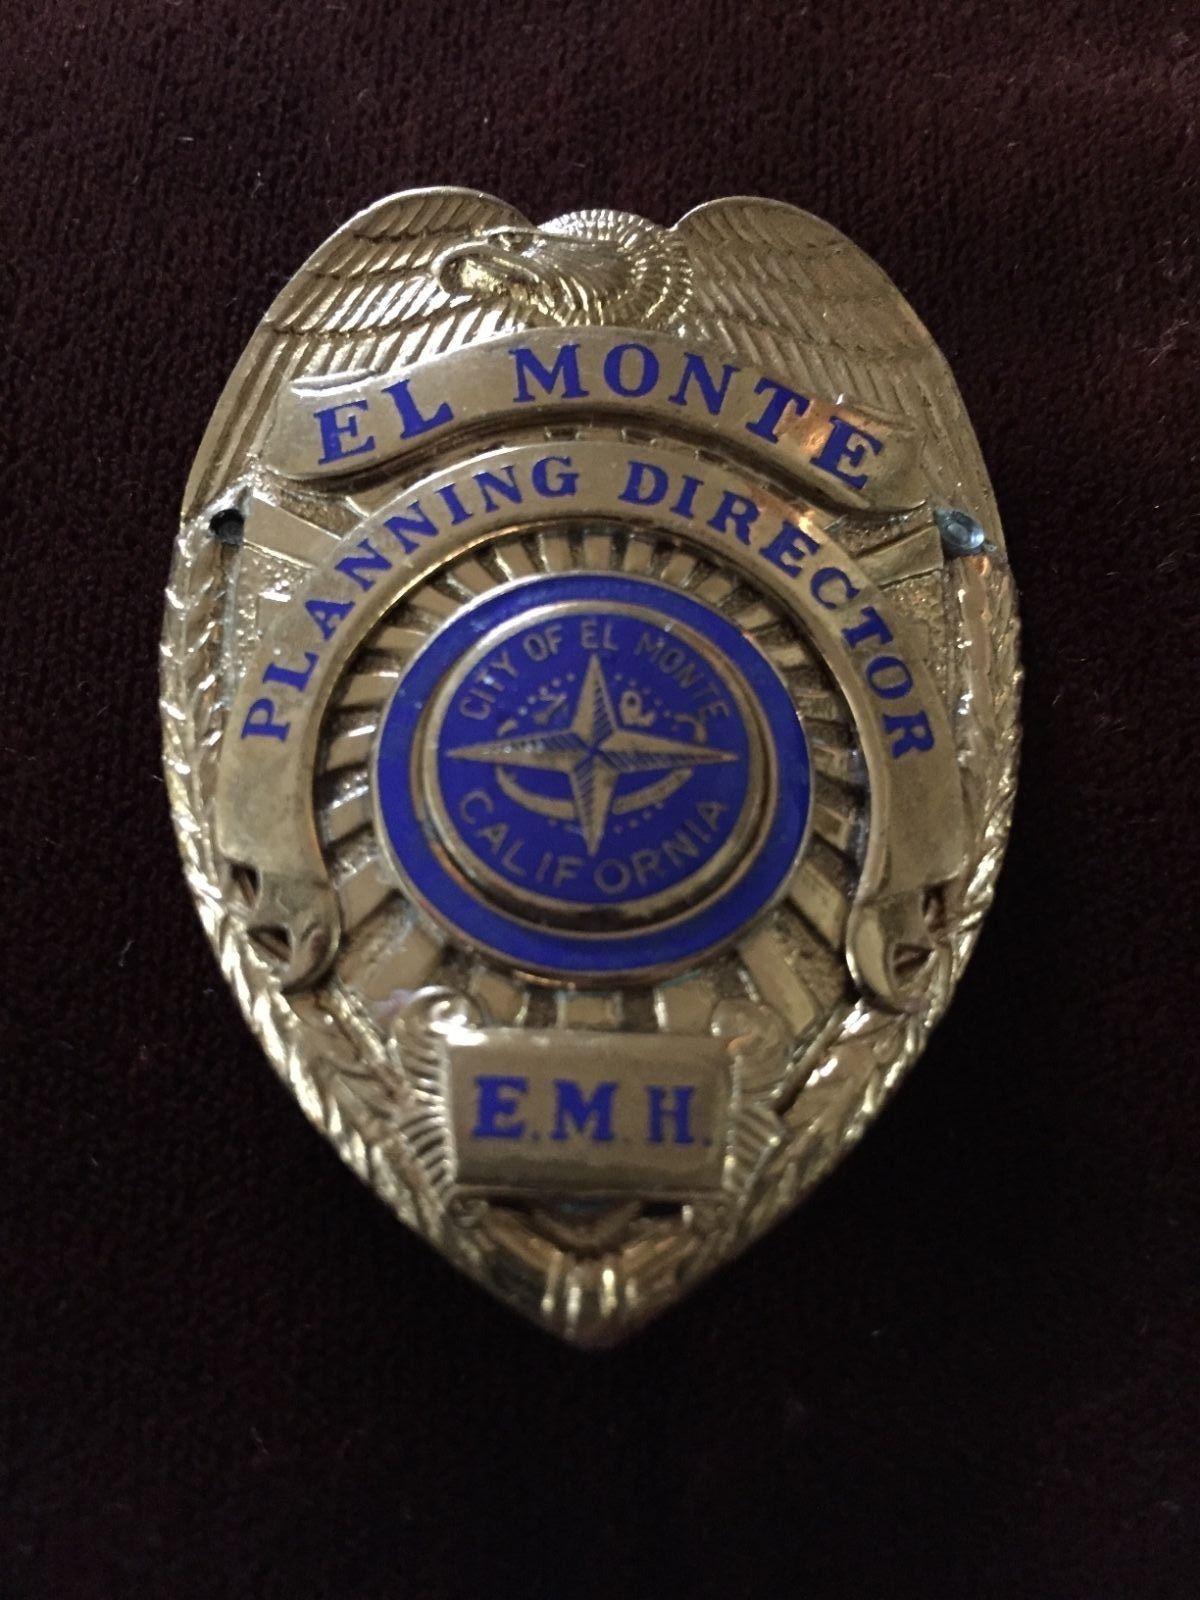 Planning Director, City of EL Monte EMH Badge, Law